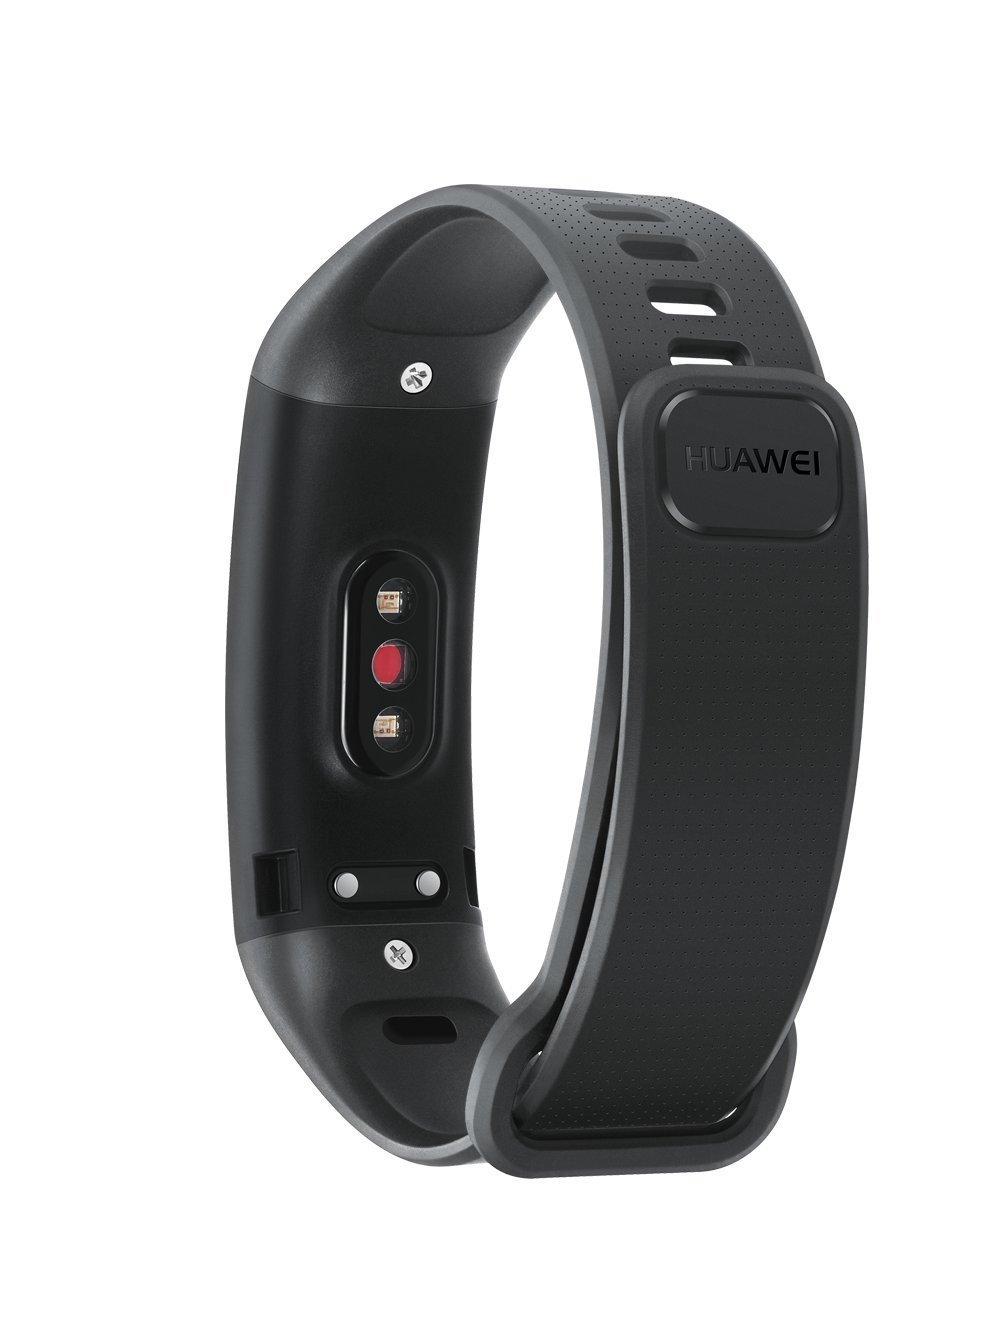 Horloge Huawei Band 2 Pro Keten Armband Fitness Voor Mobiele Huawei (Gps Geïntegreerde, Firstbeat Systeem). Kleur Zwart (Zwart). - 5